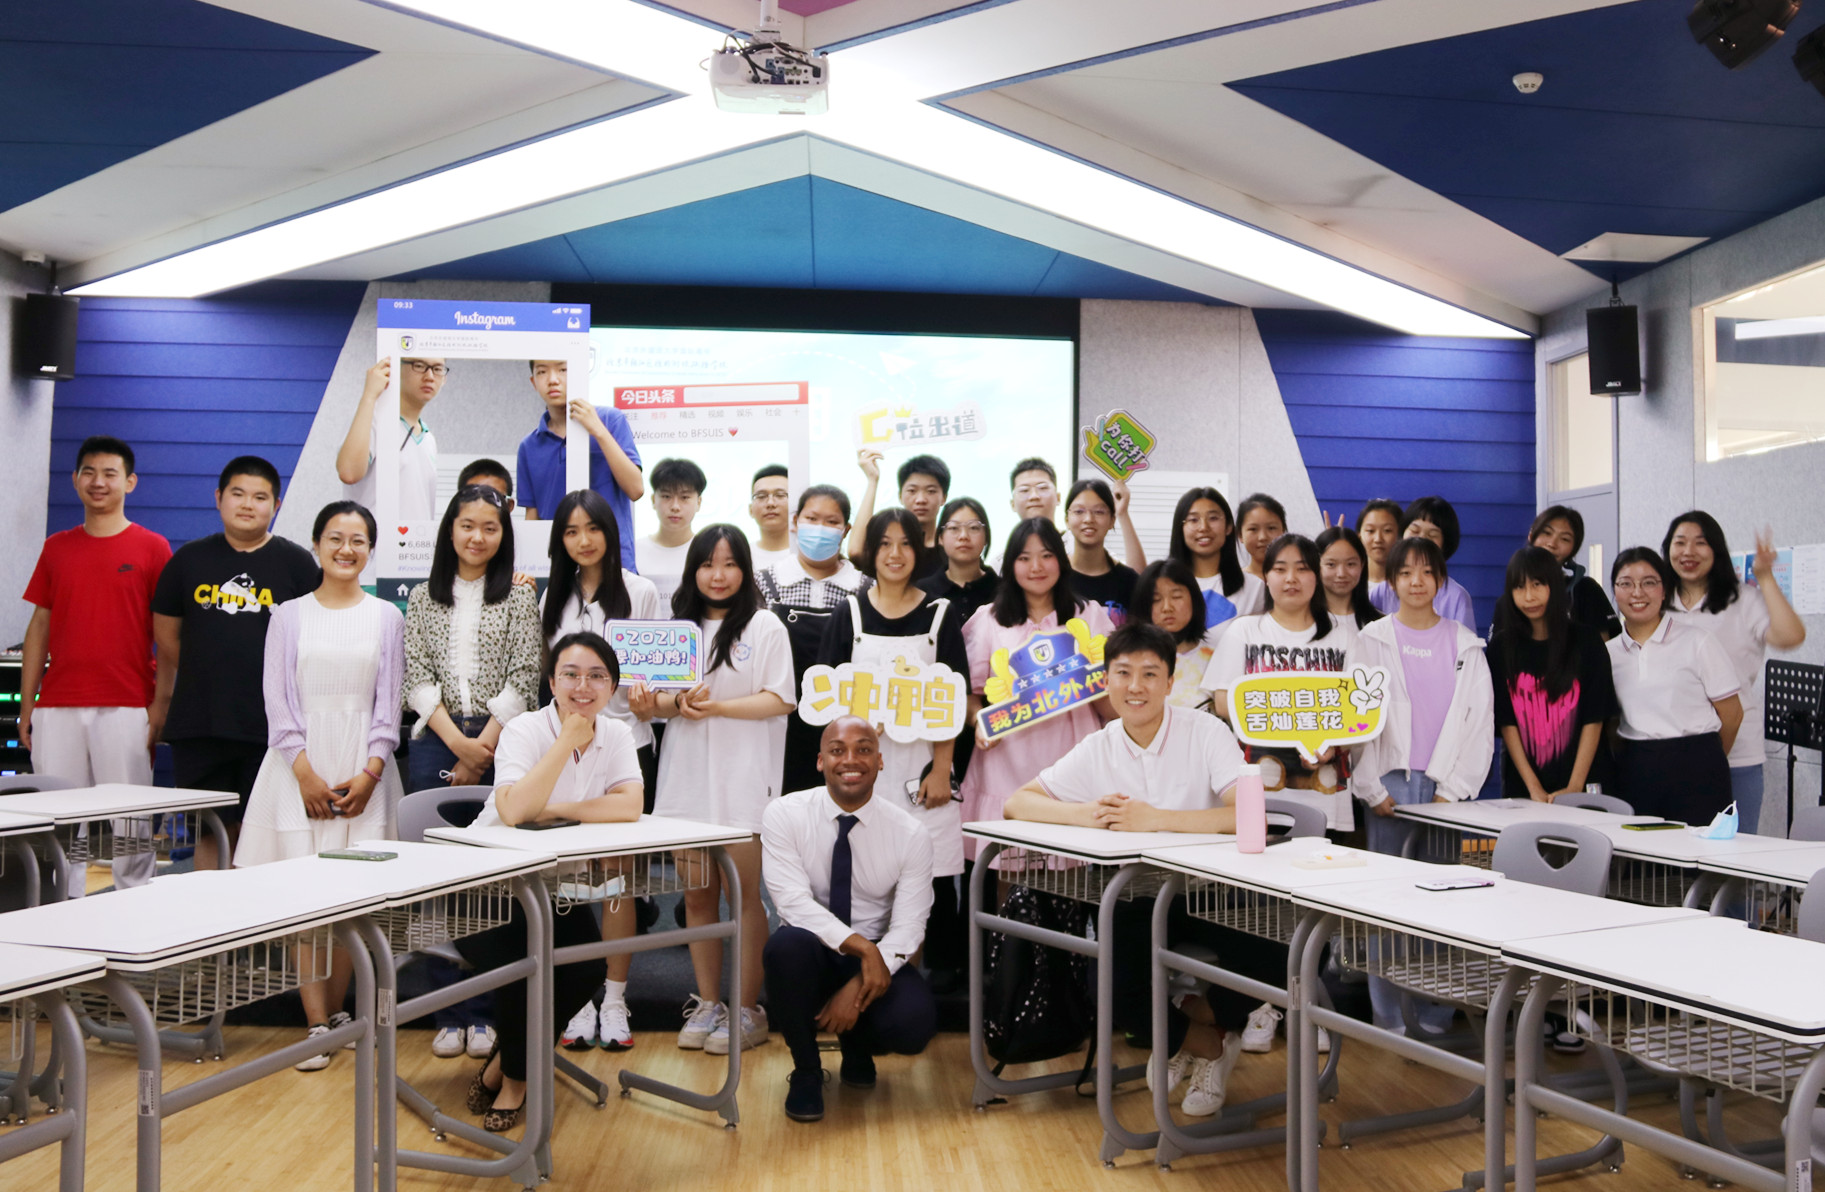 Summer Camp | 课程丰富!北外附校双语学校的暑期夏令营来啦!